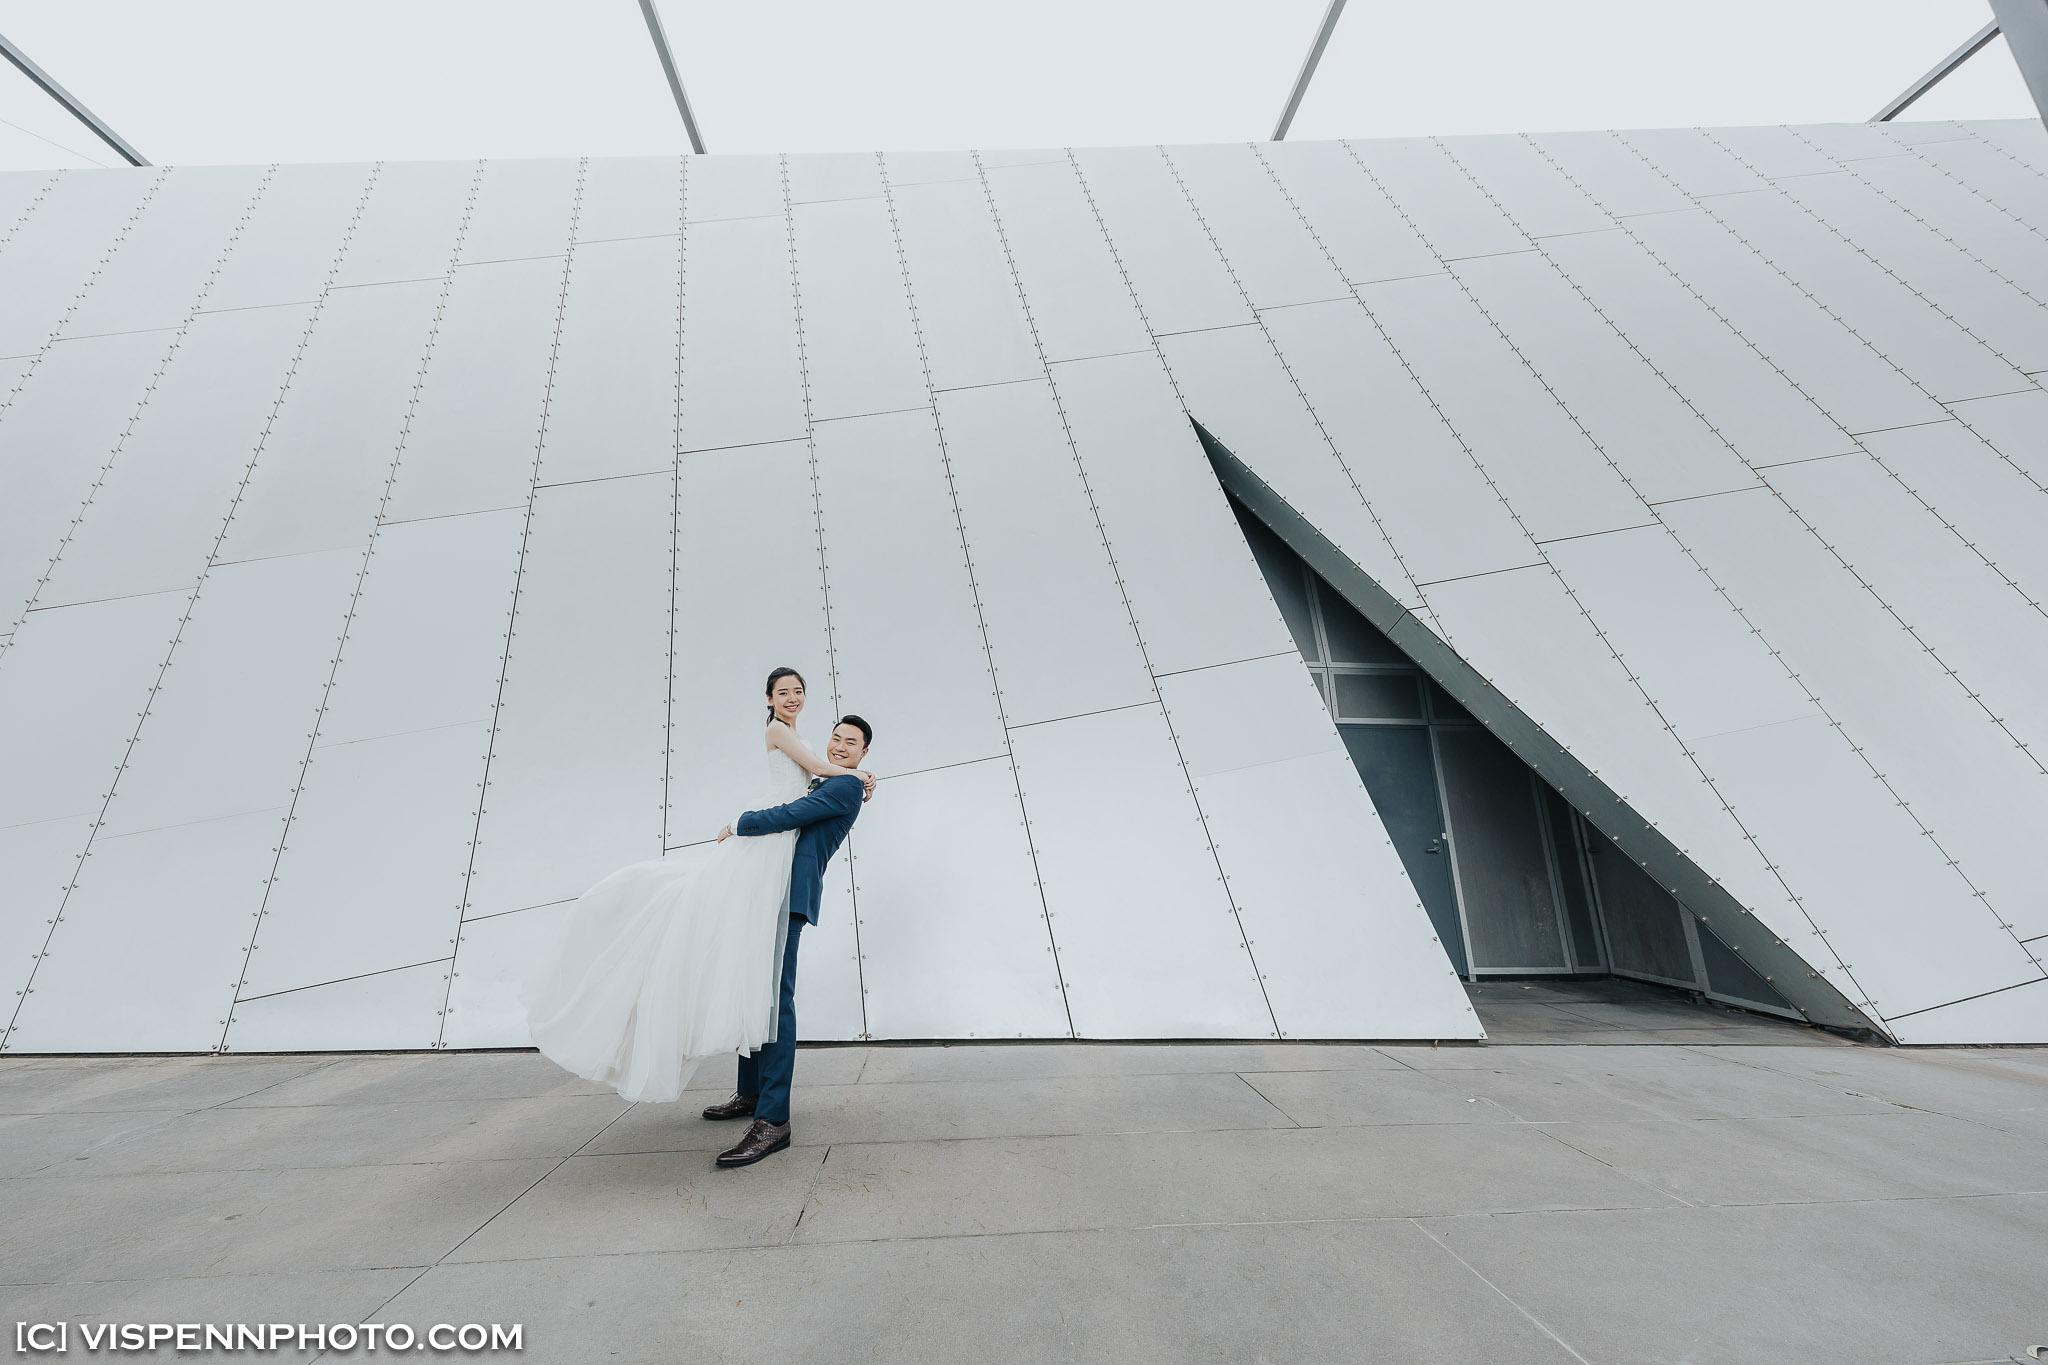 PRE WEDDING Photography Melbourne VISPENN 墨尔本 婚纱照 结婚照 婚纱摄影 VISPENN SallyZY 2289 1